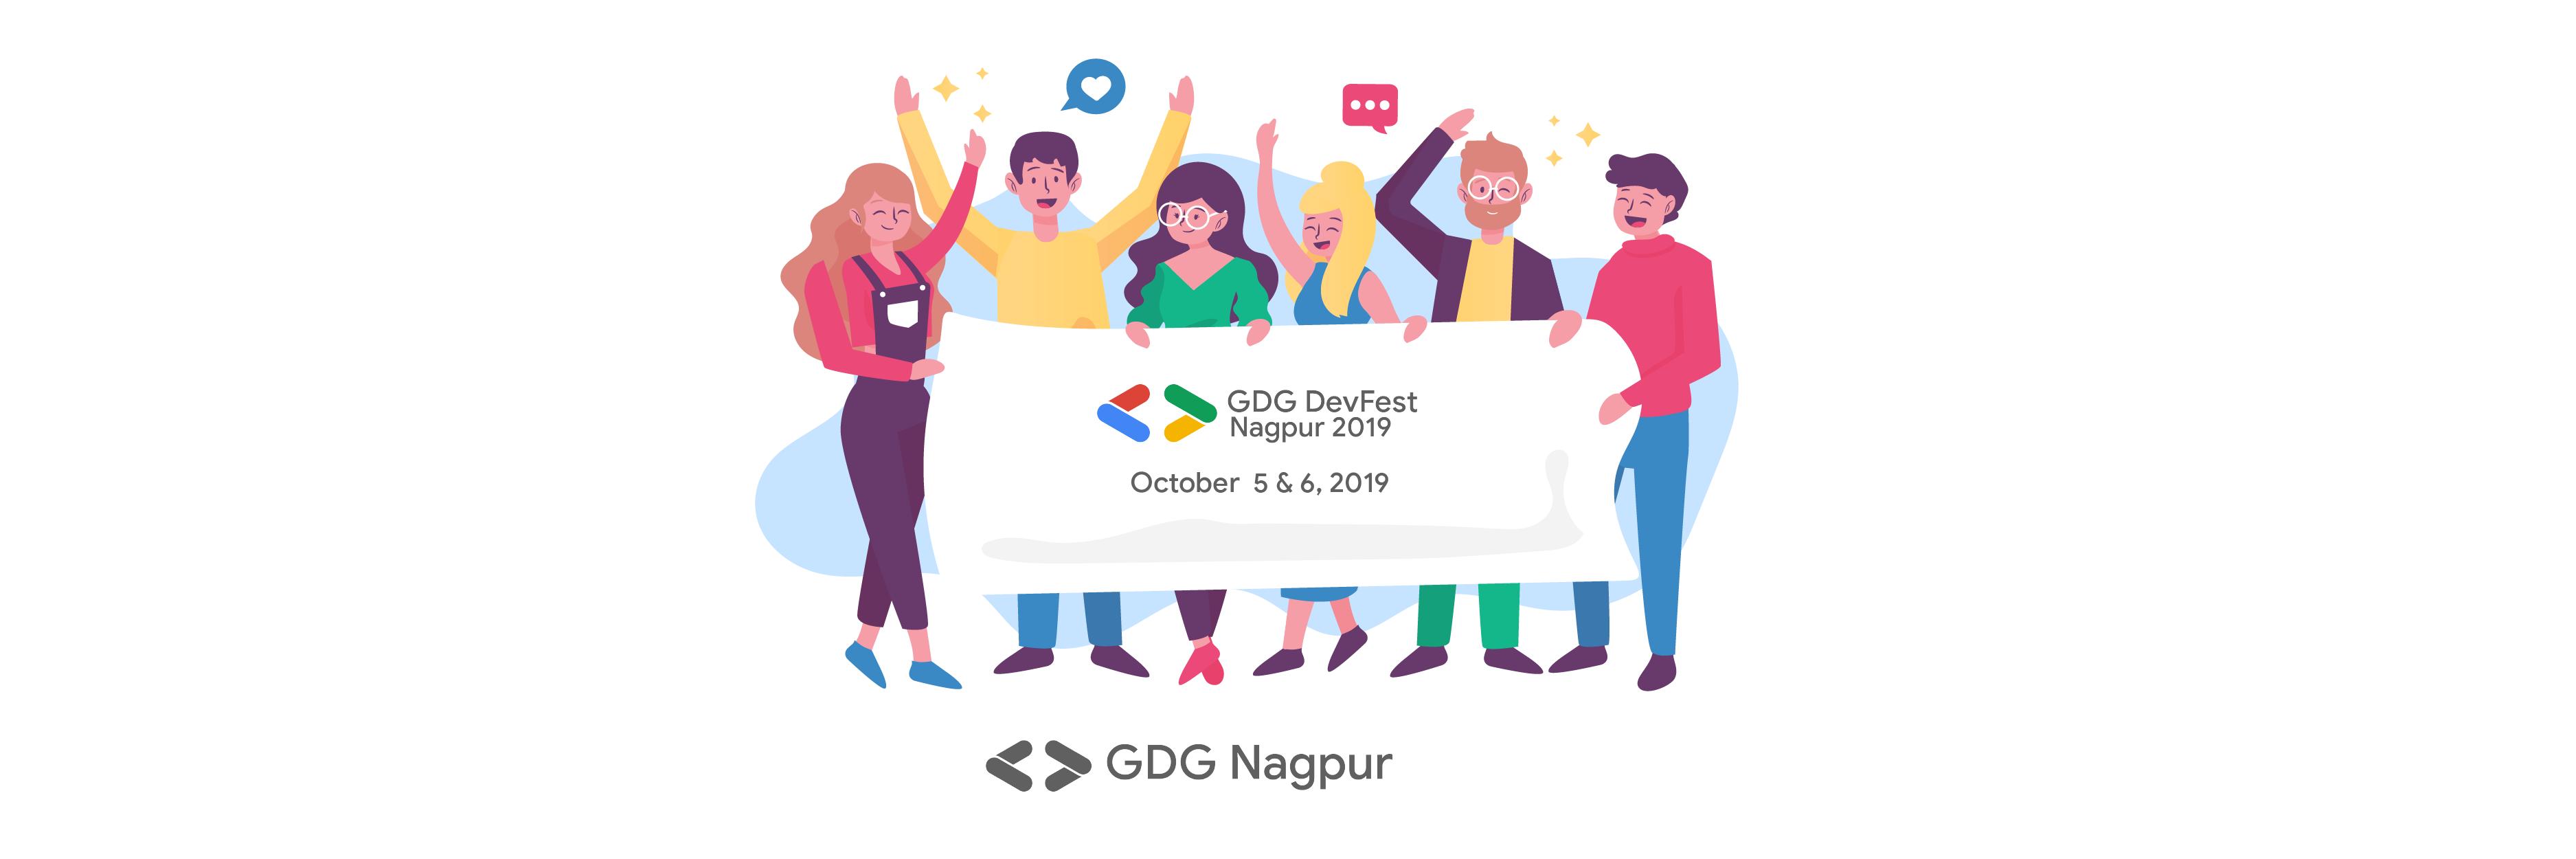 GDG DevFest Nagpur 2019